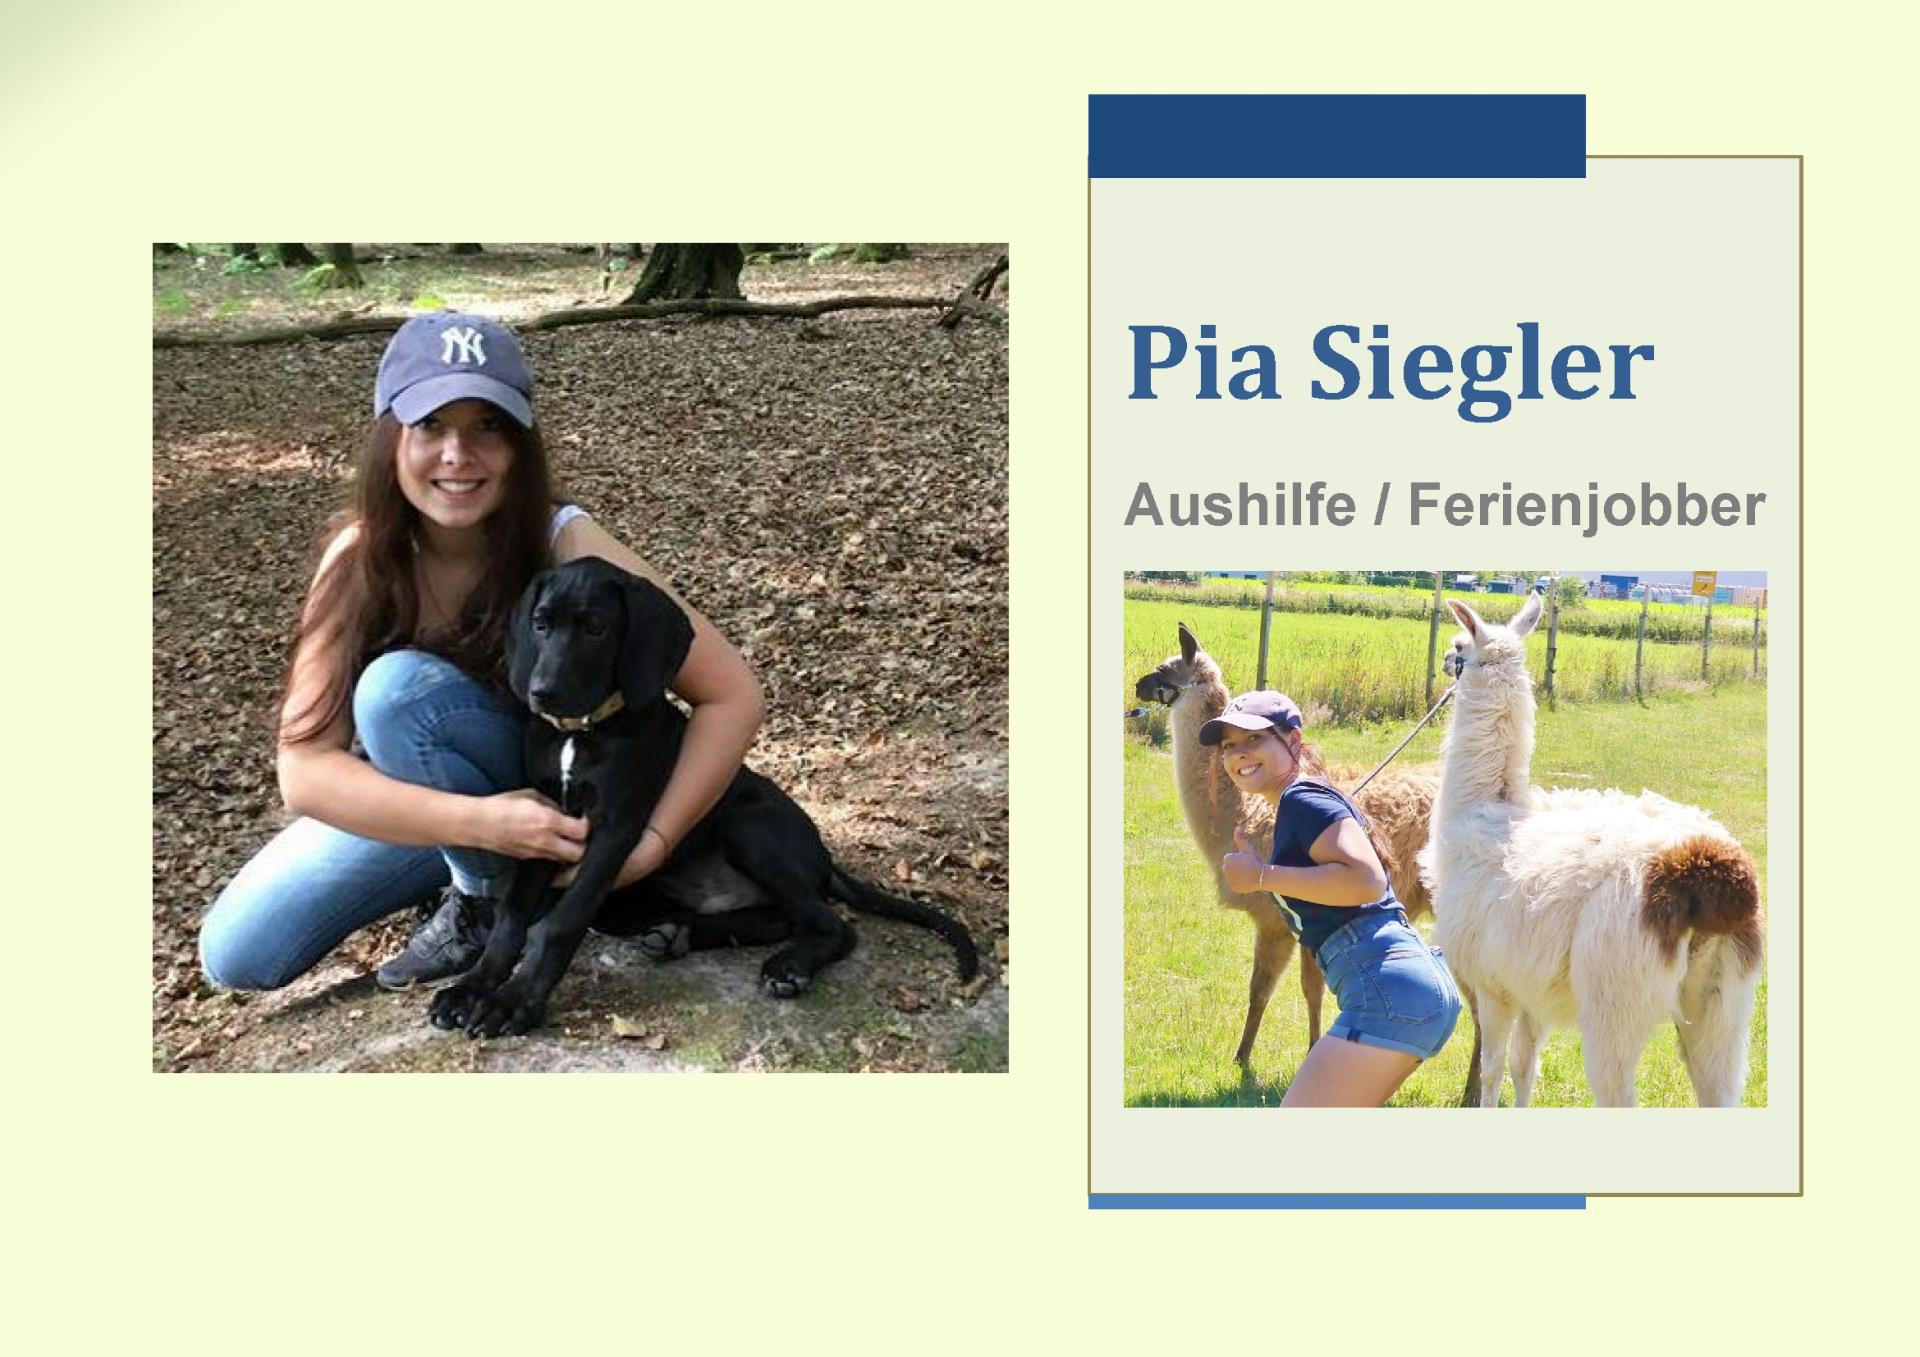 Pia Siegler